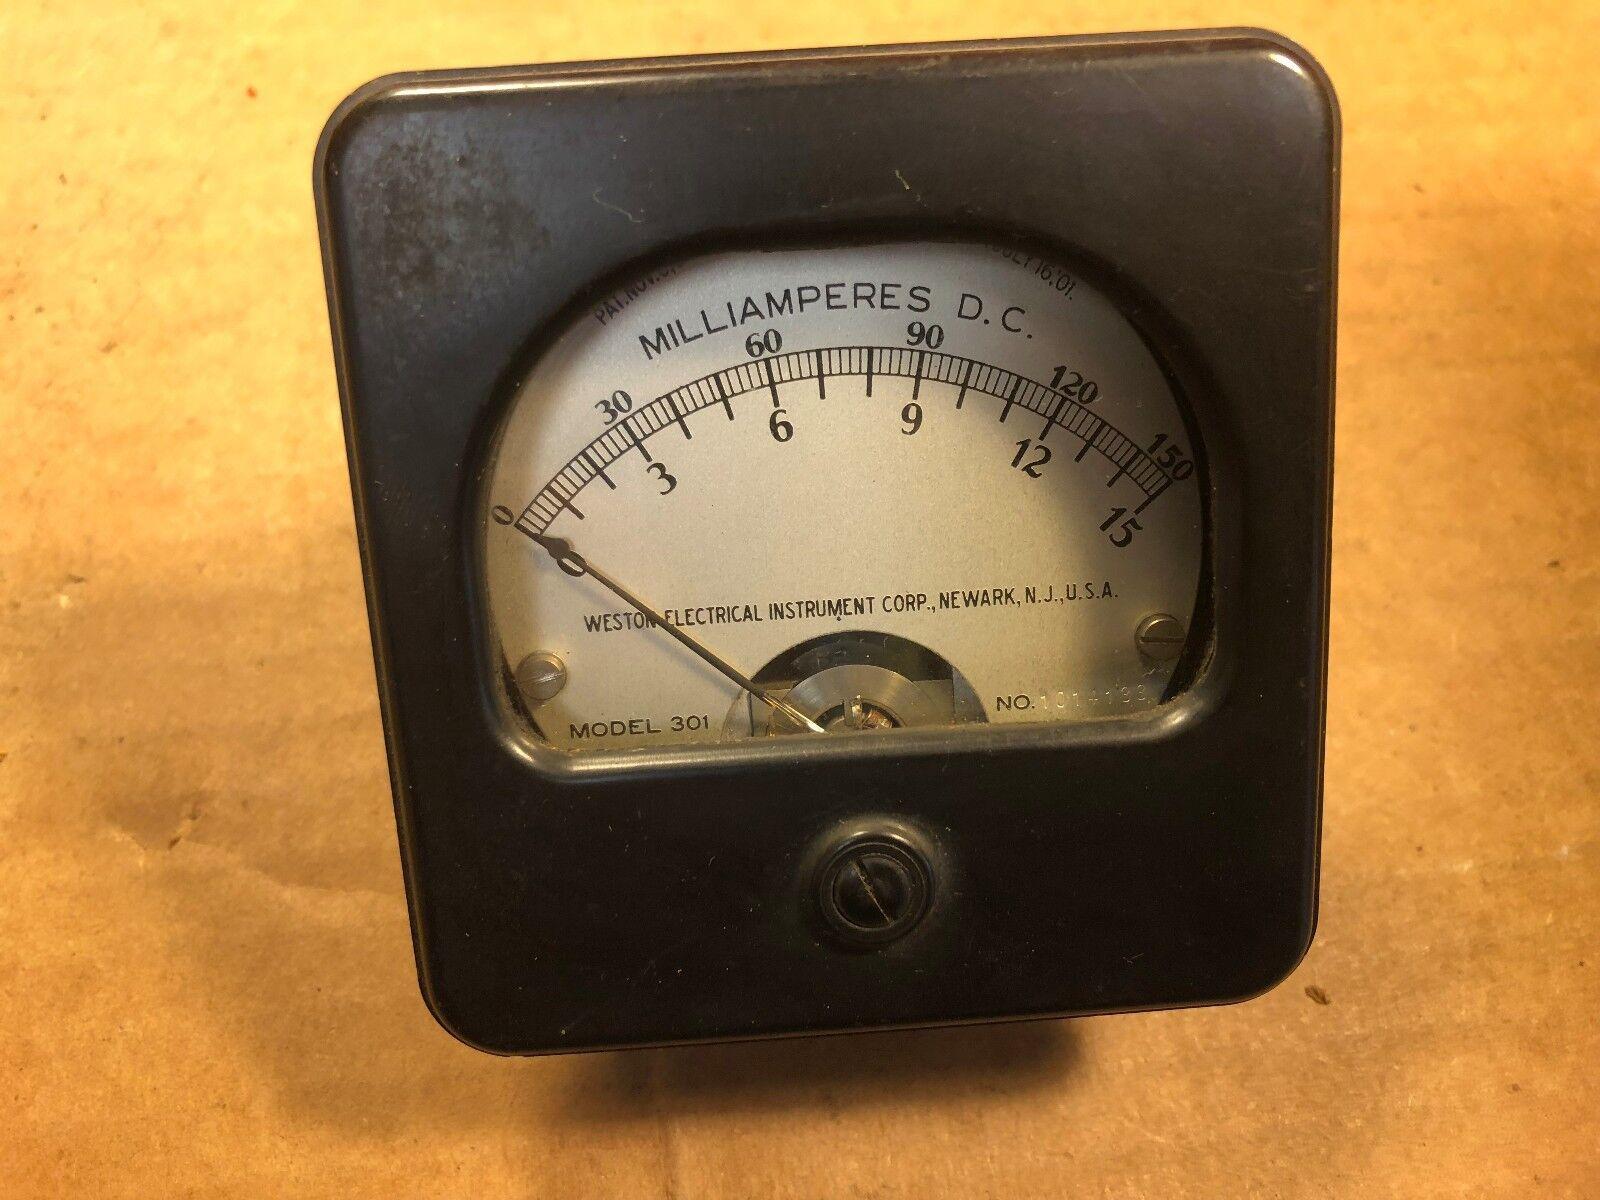 Antique Weston Model 301 DC MilliAmperes Meter Measures 0-150 mA 1900s Gauge